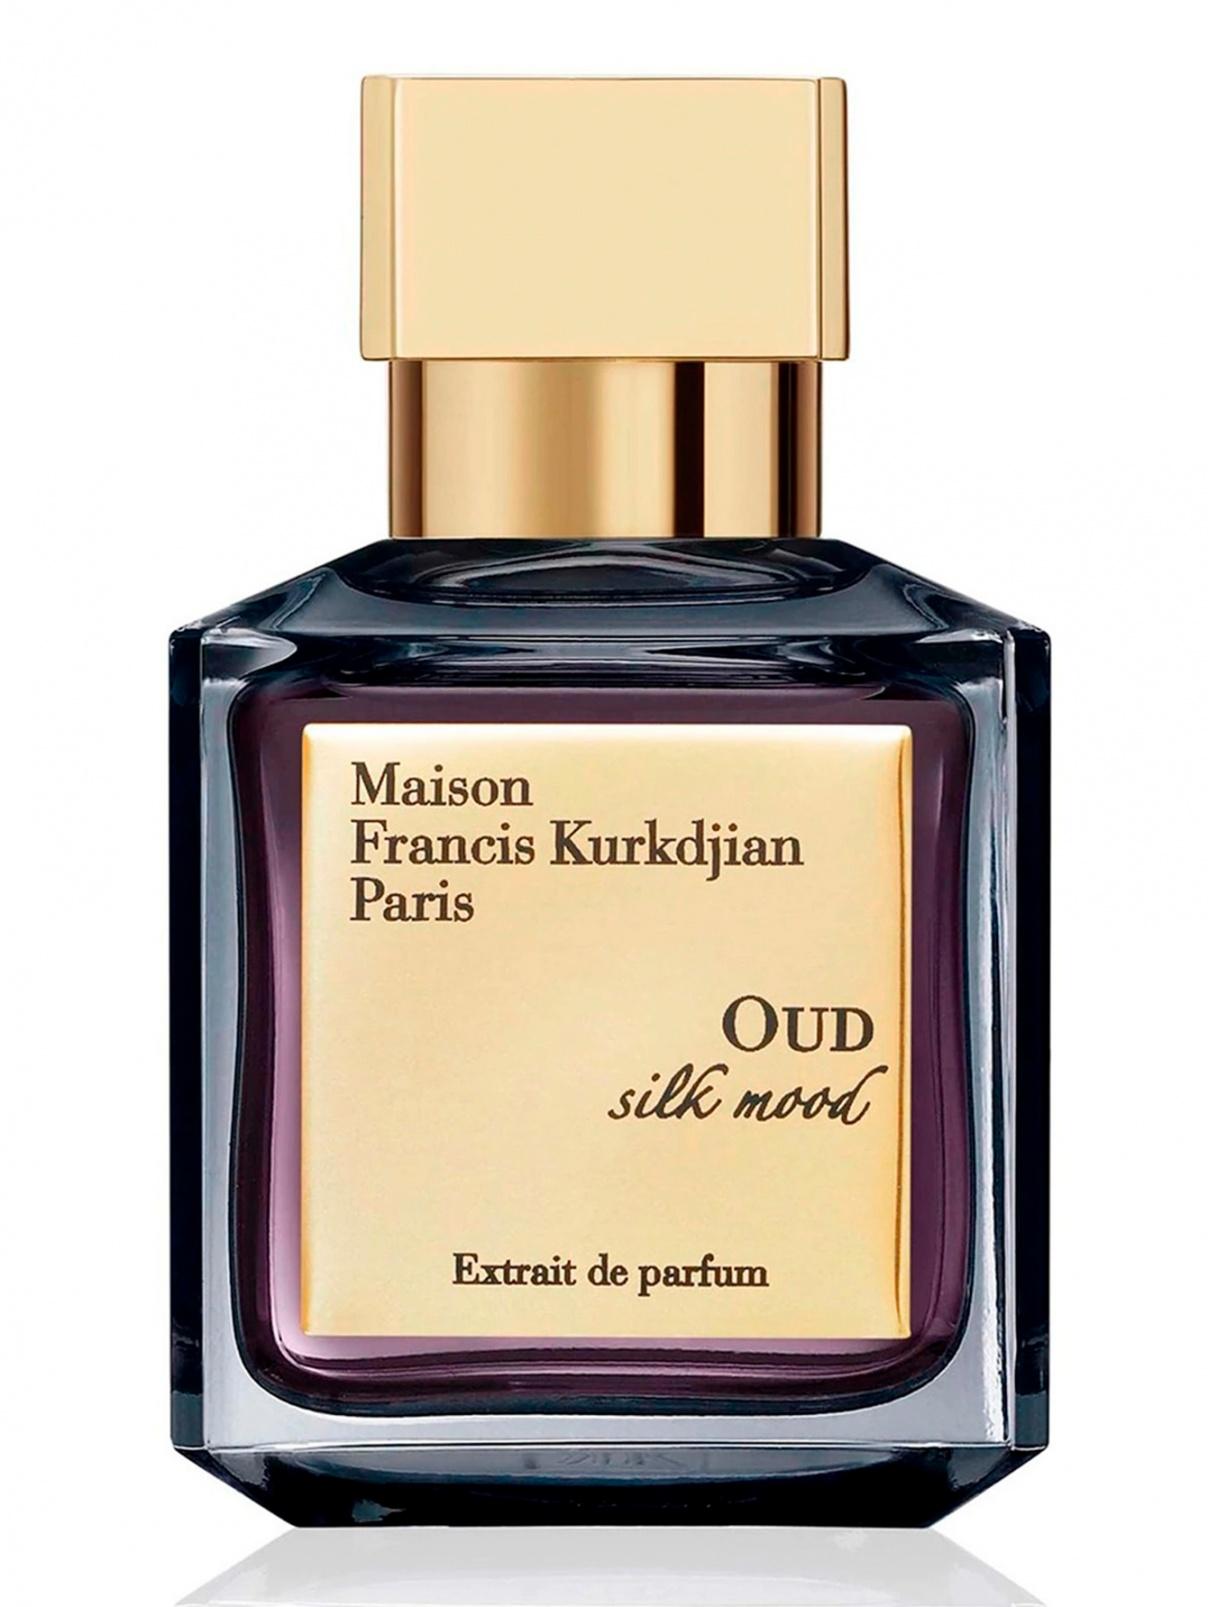 Парфюмерная вода - Silk mood,Oud, 70ml Maison Francis Kurkdjian  –  Общий вид